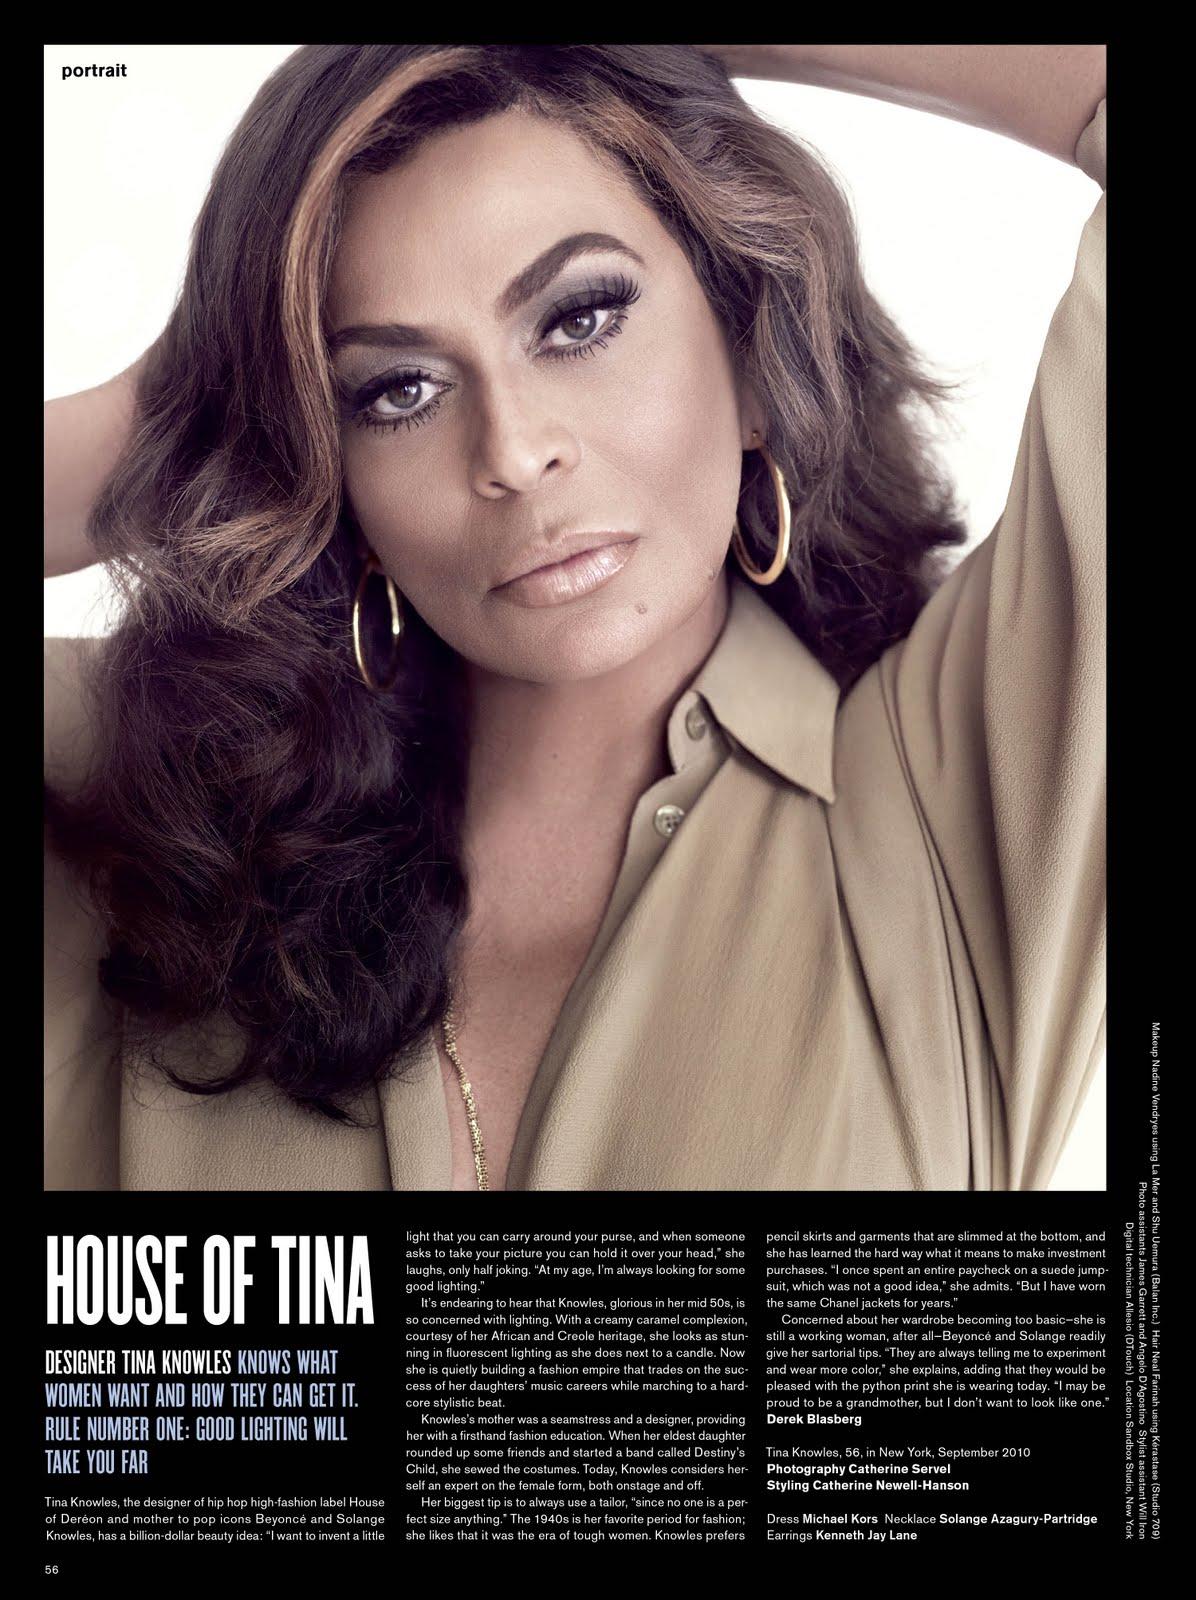 http://1.bp.blogspot.com/_UGqqaXi6b30/TOUzRQ4sULI/AAAAAAAAAJU/emfSXw1eUFk/s1600/Catherine%2BServel-Tina-Knowles-V-Magazine.jpg